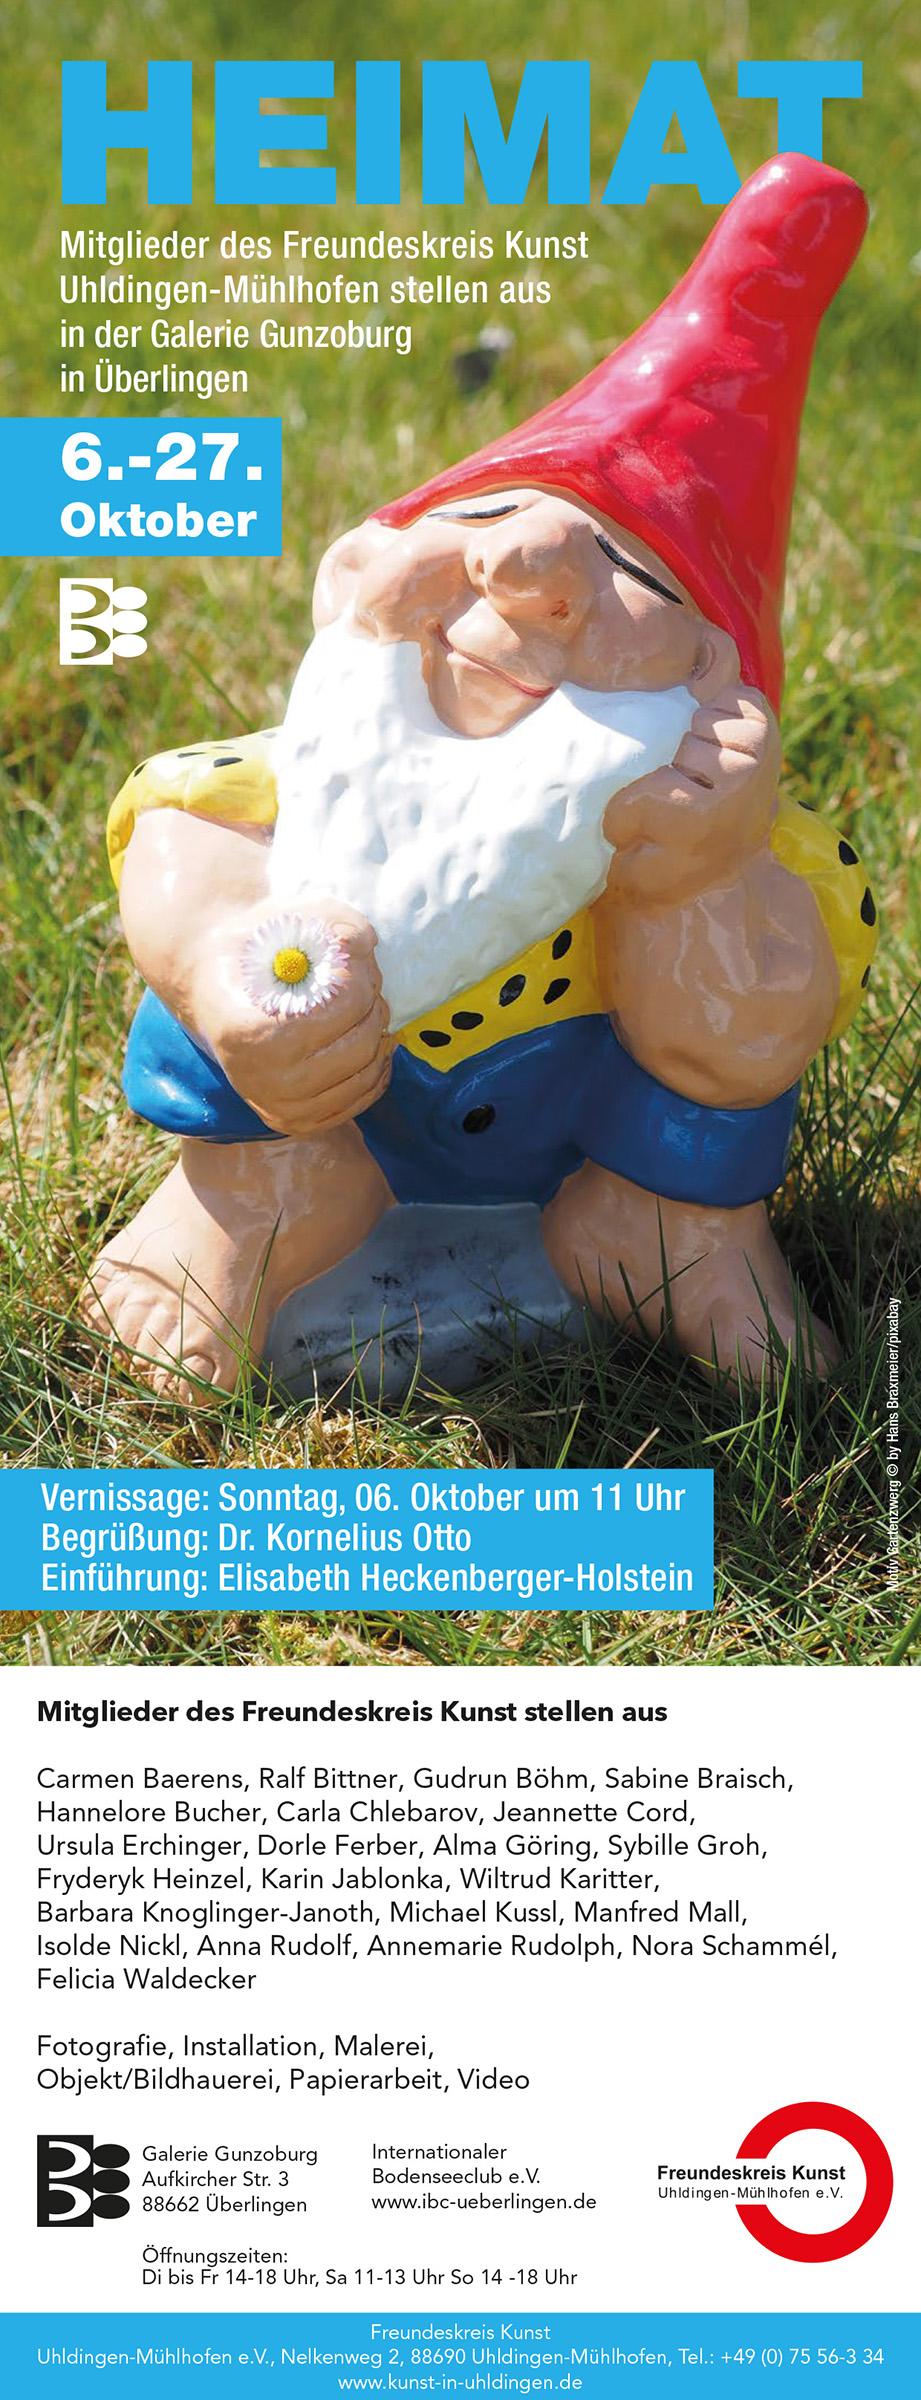 Rudolf single überlingen